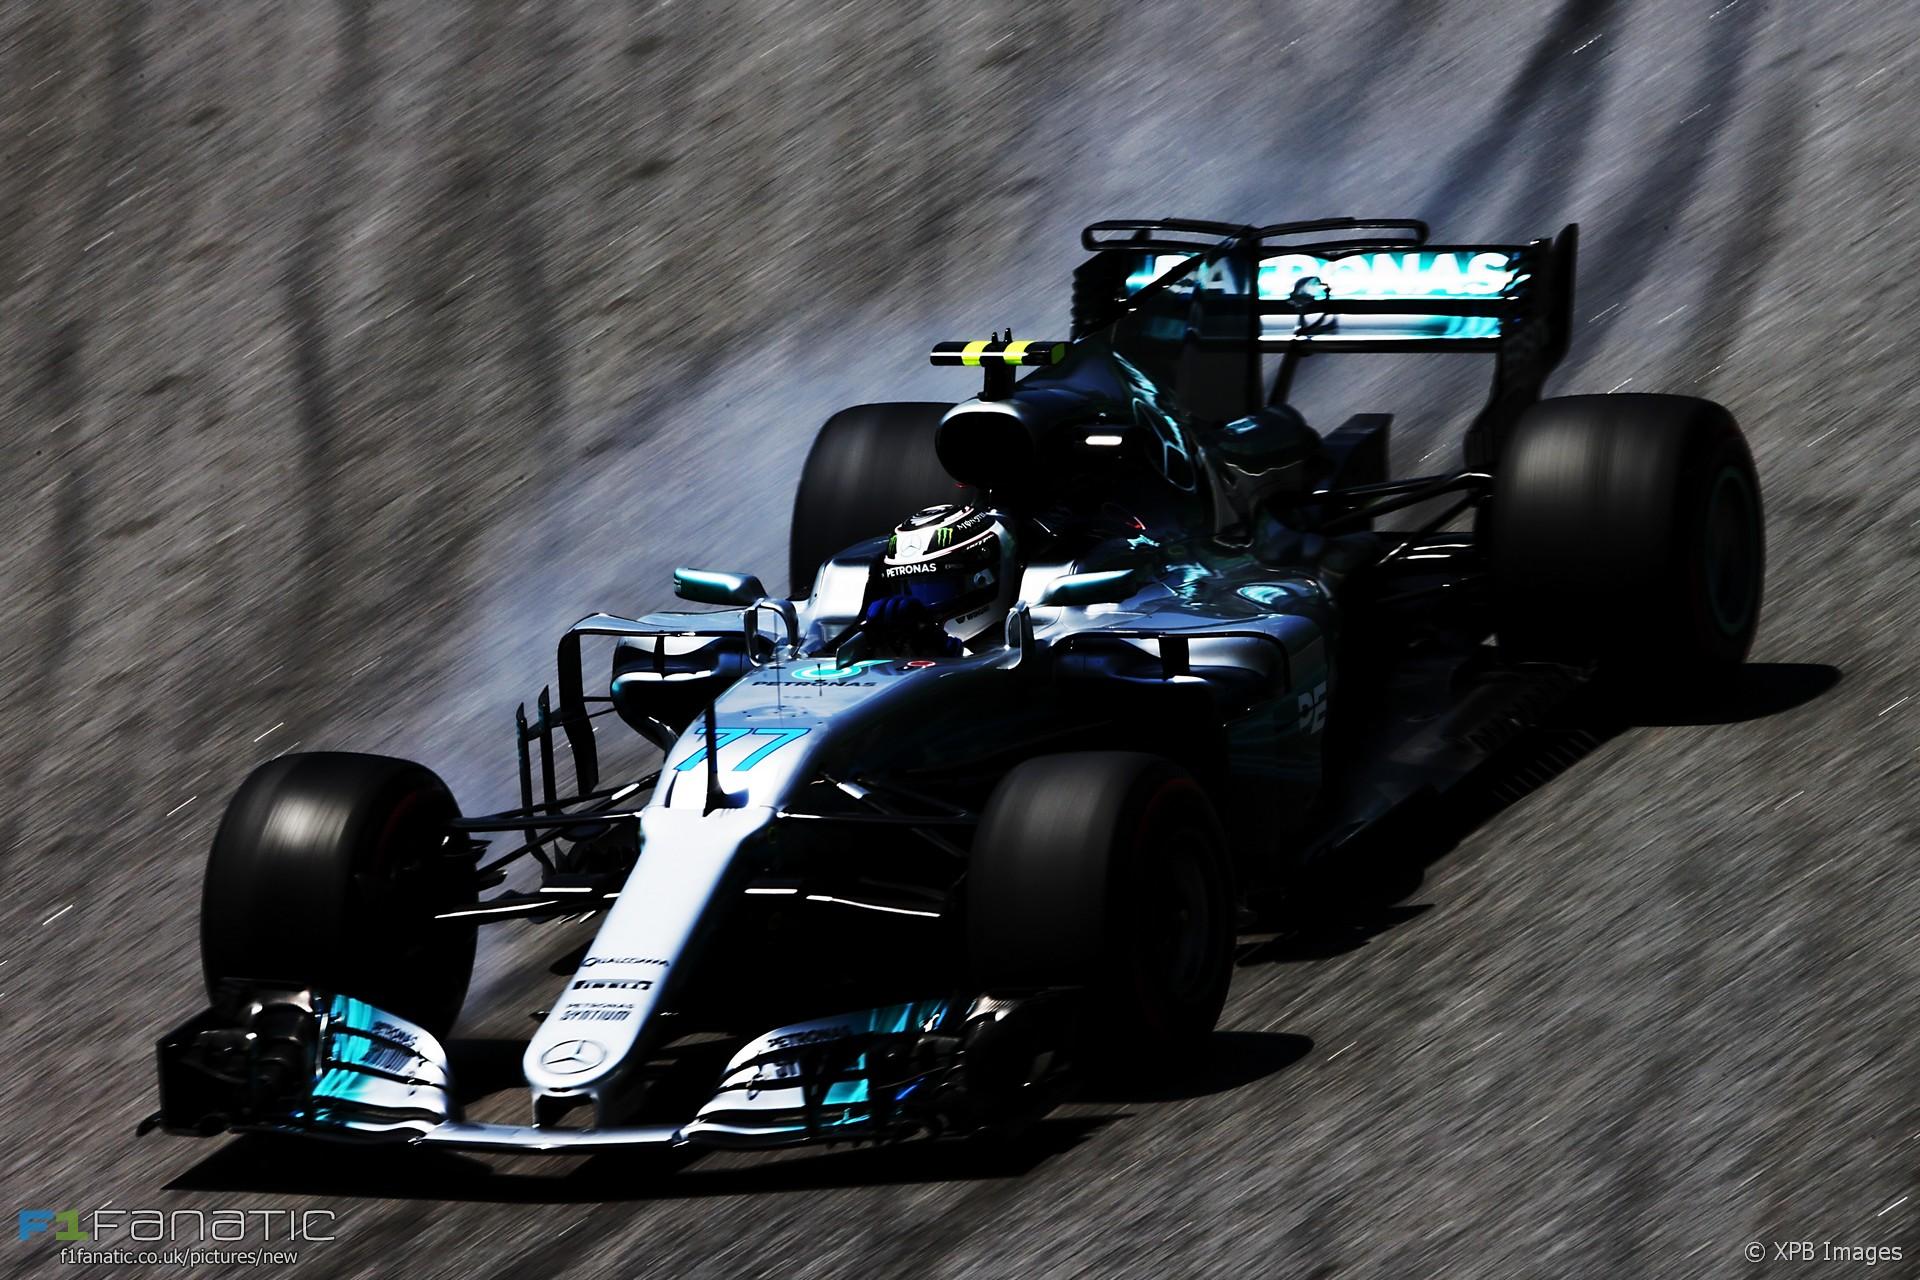 Valtteri Bottas, Mercedes, Interlagos, 2017